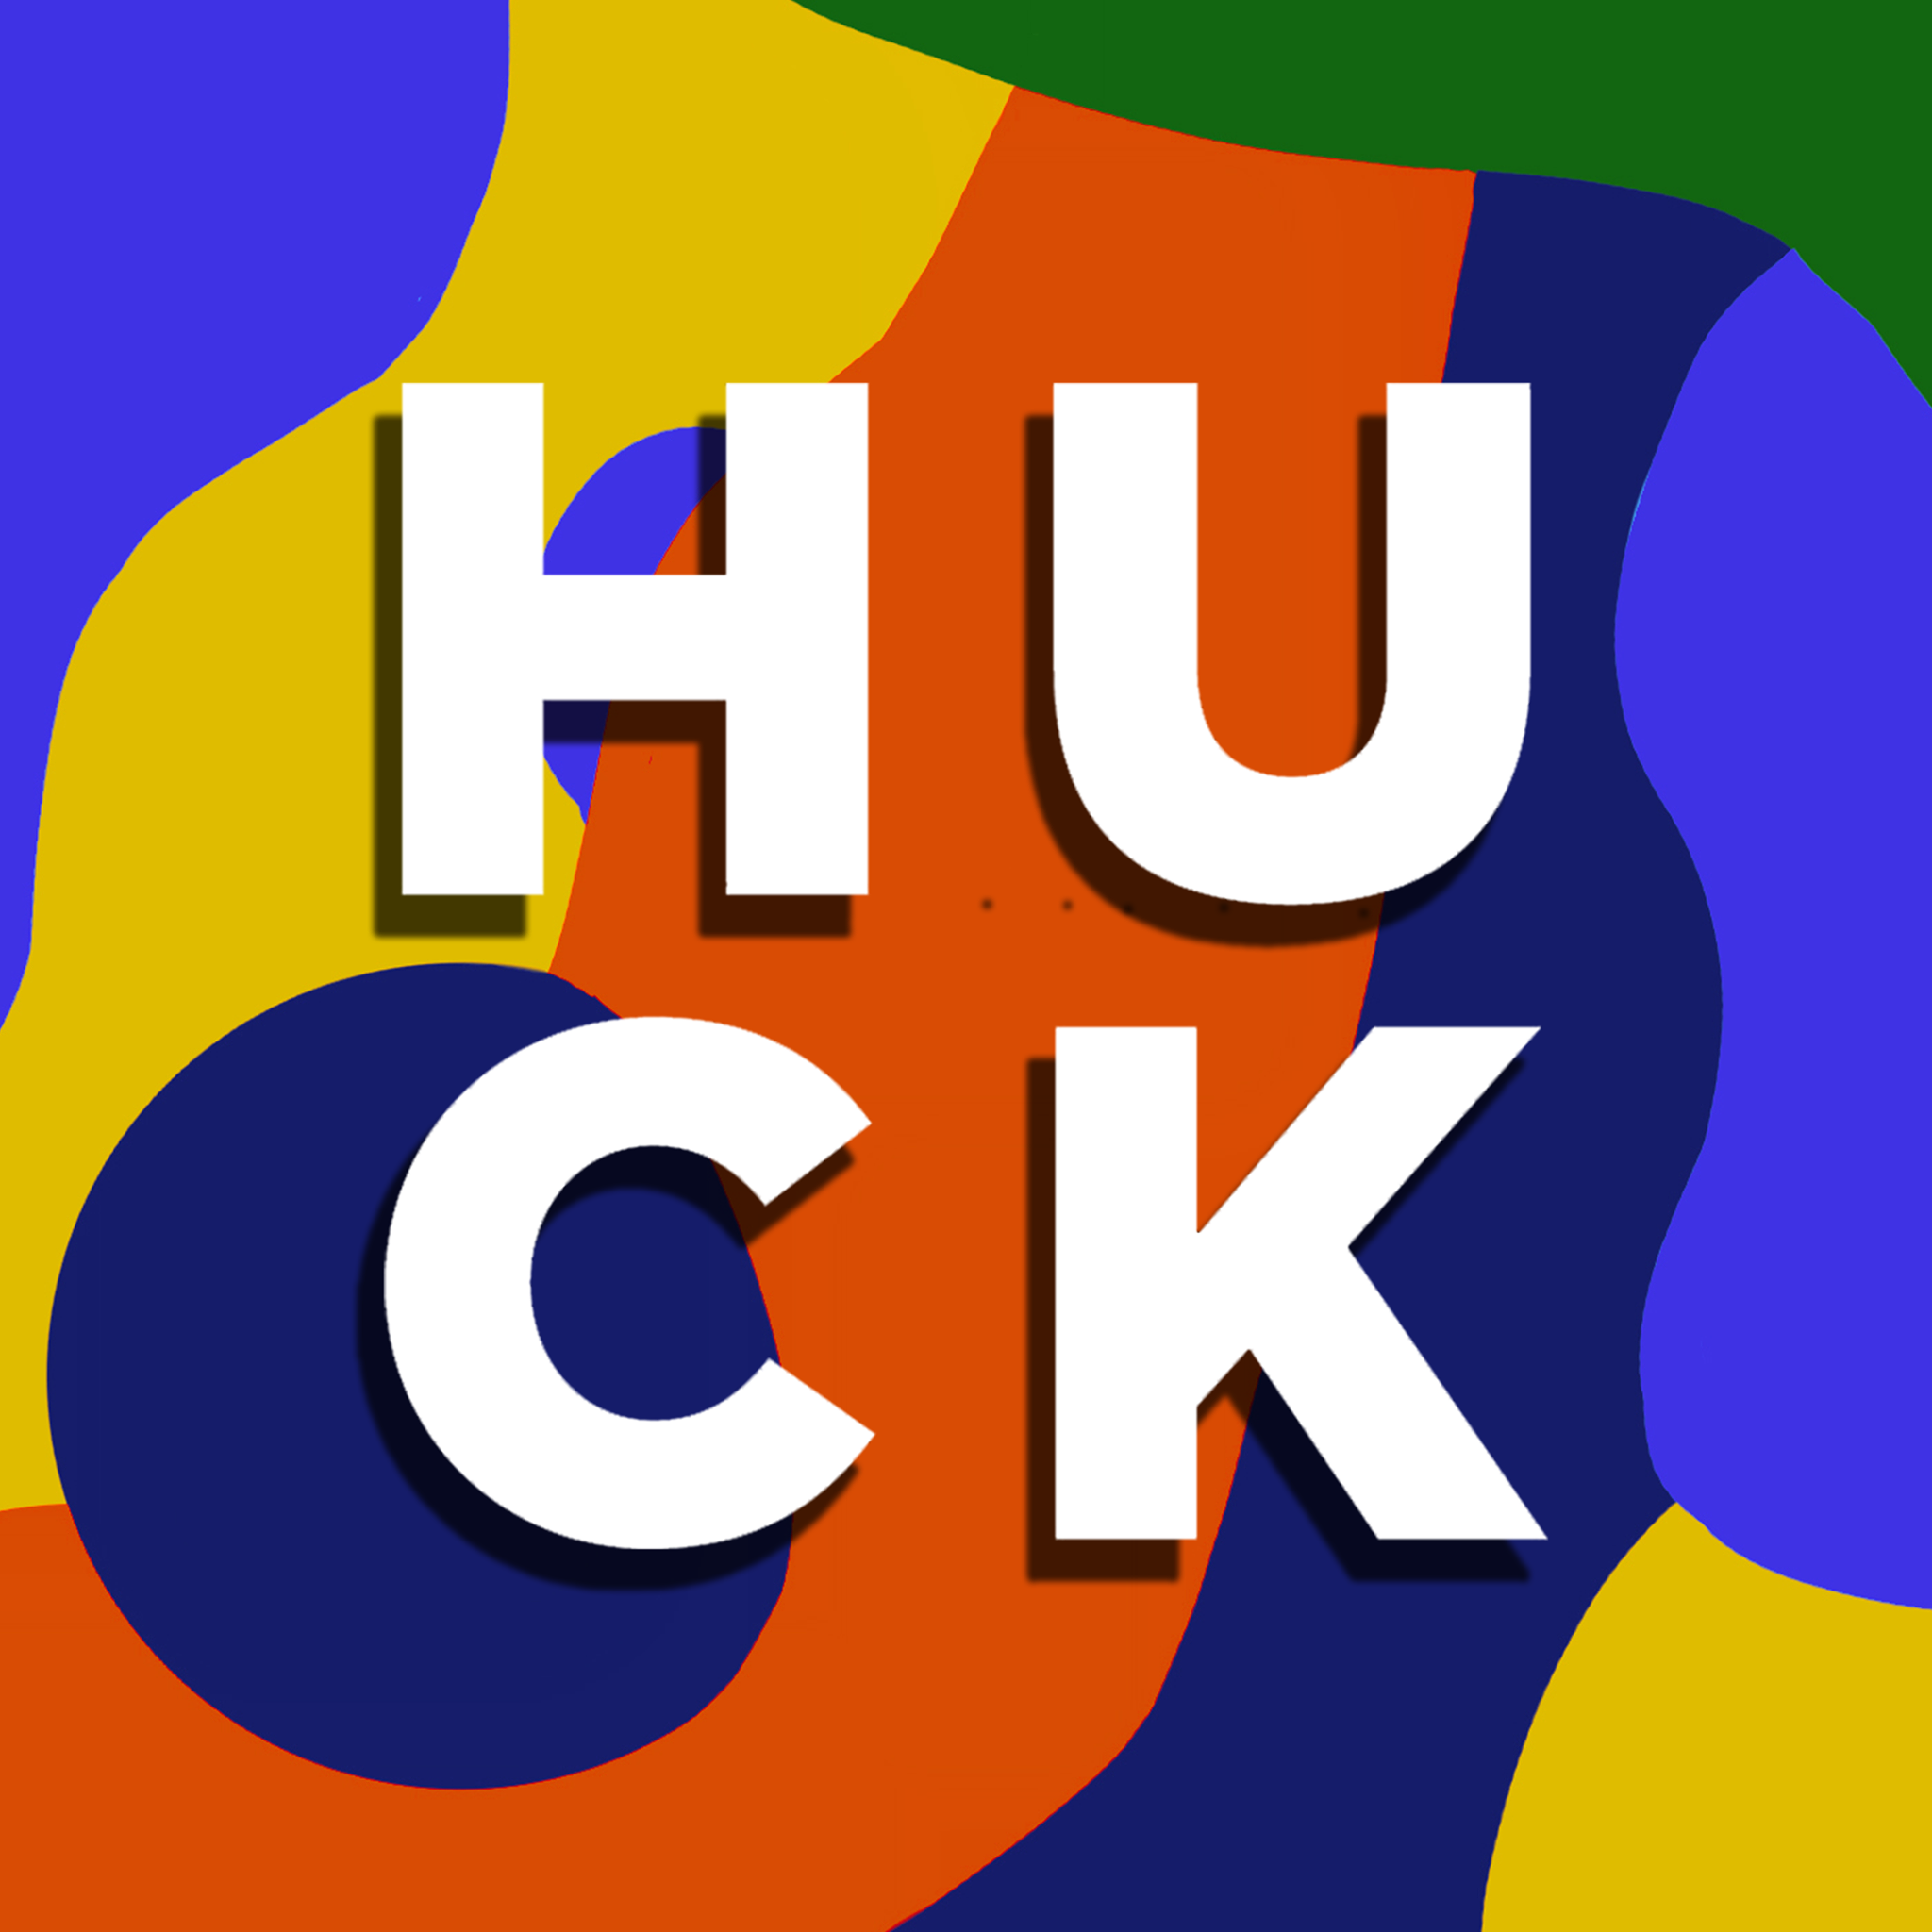 Huckleberry Roasters